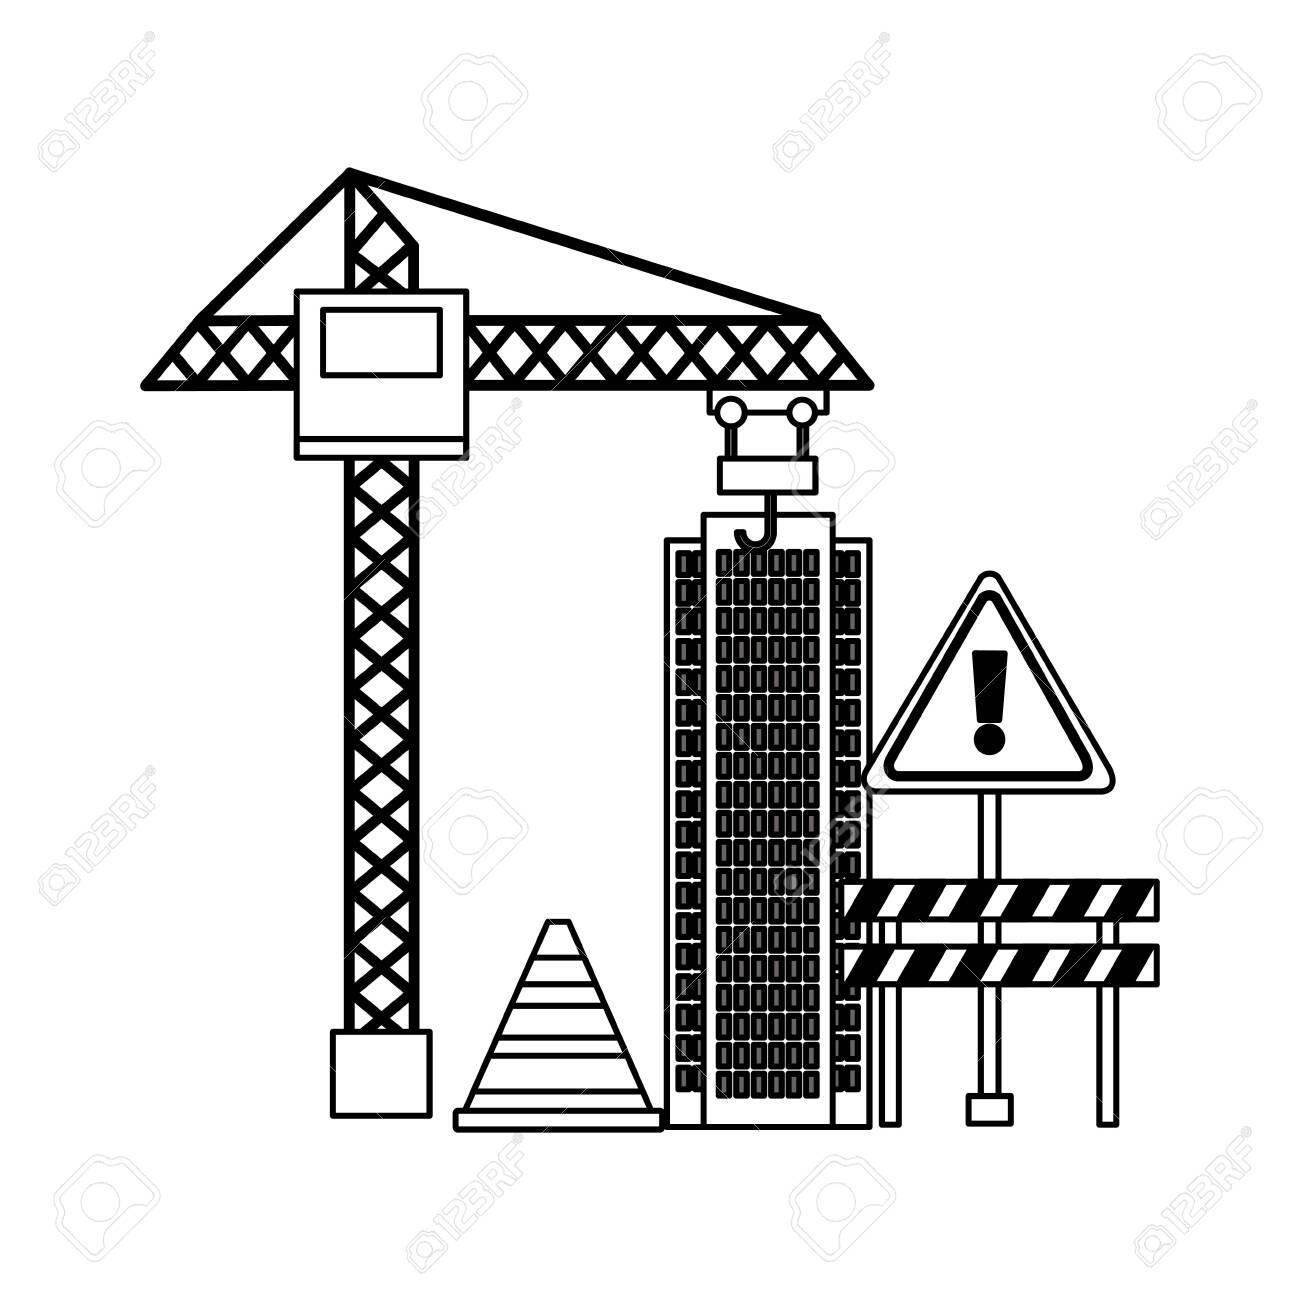 crane construction building barrier caution sign equipment vector illustration - 122575599